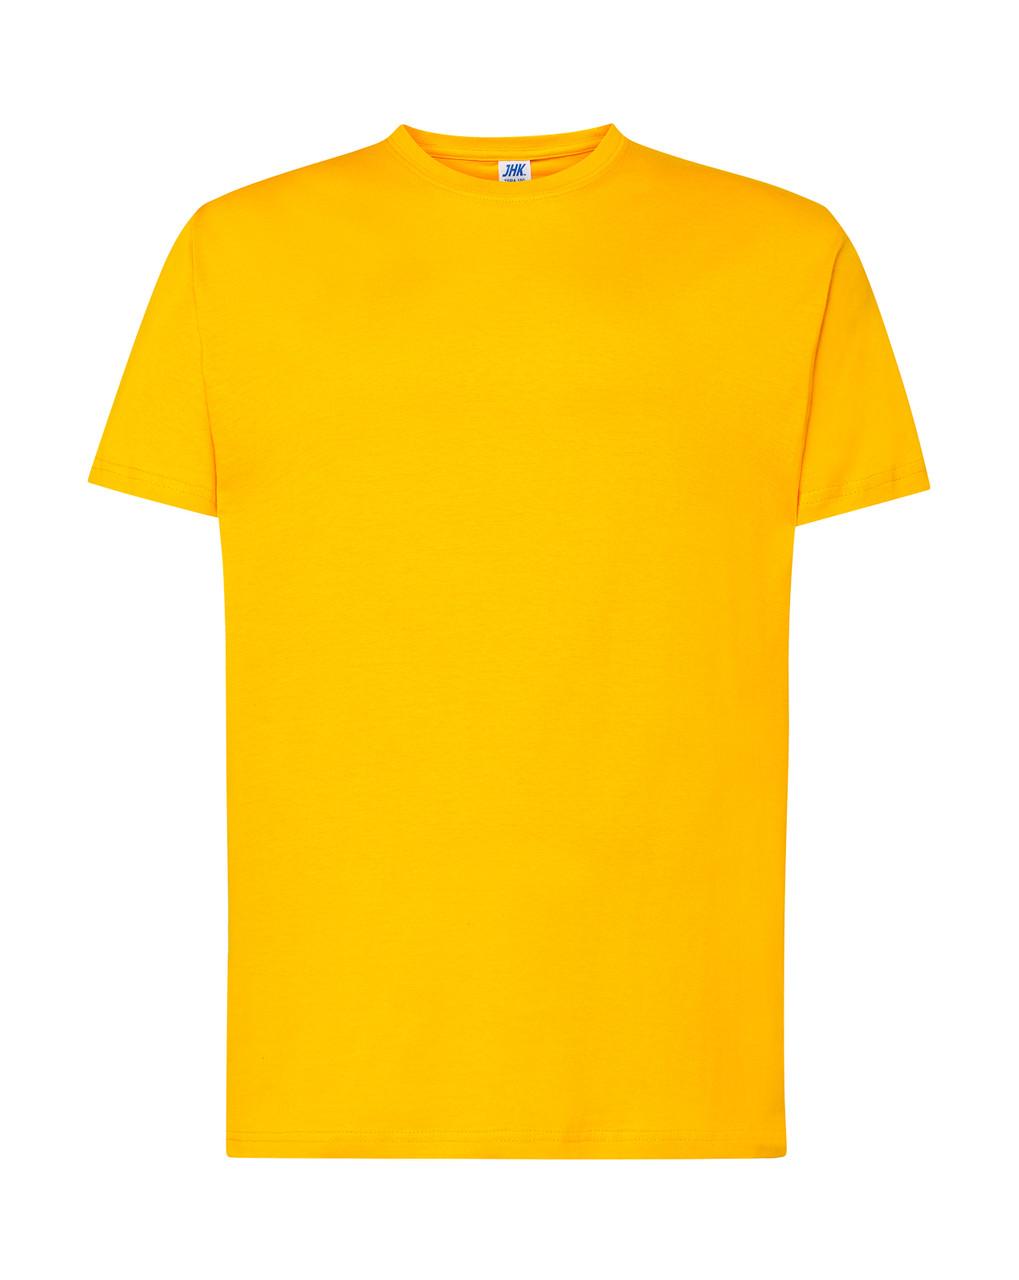 Мужская футболка JHK REGULAR PREMIUM T-SHIRT цвет персиковый (PH)